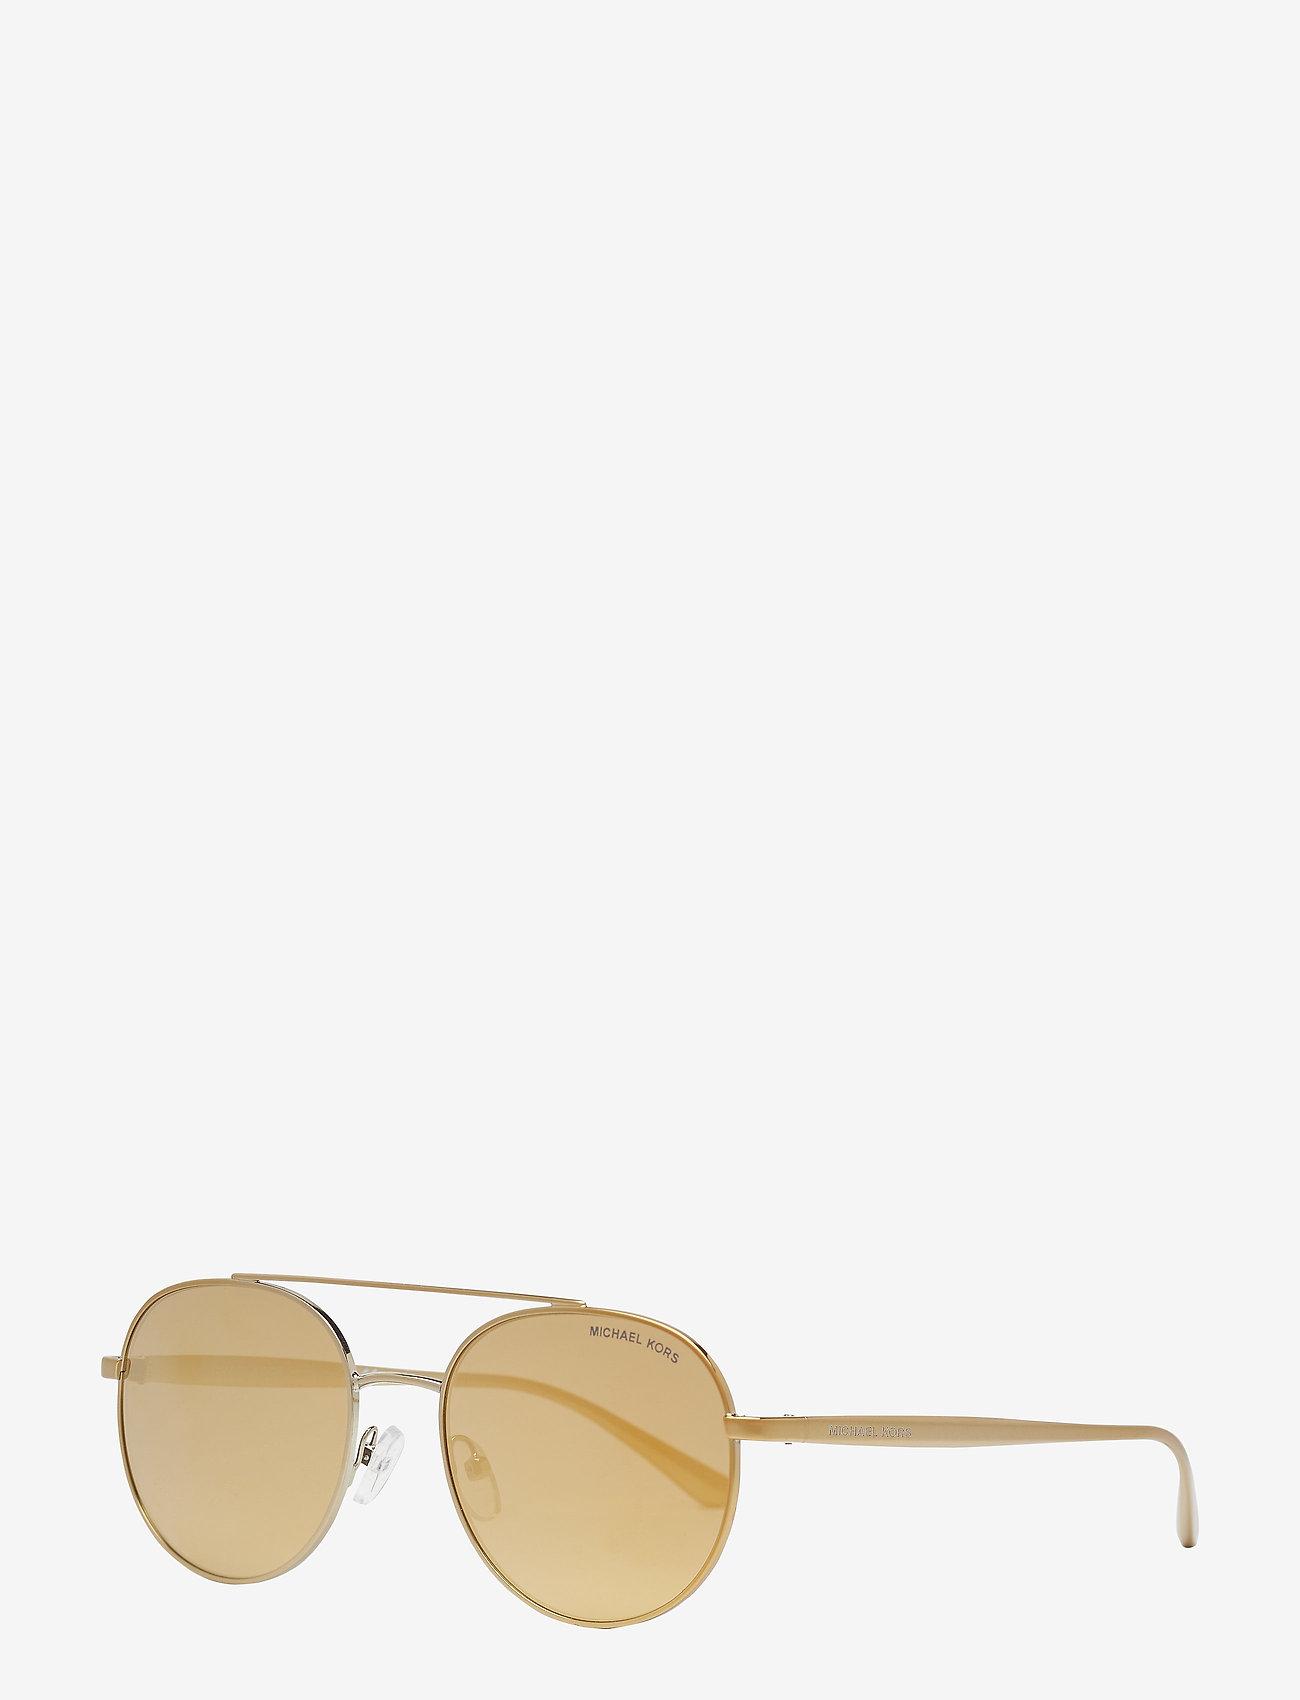 Michael Kors Sunglasses - Aviator - pilot - gold-tone - 1